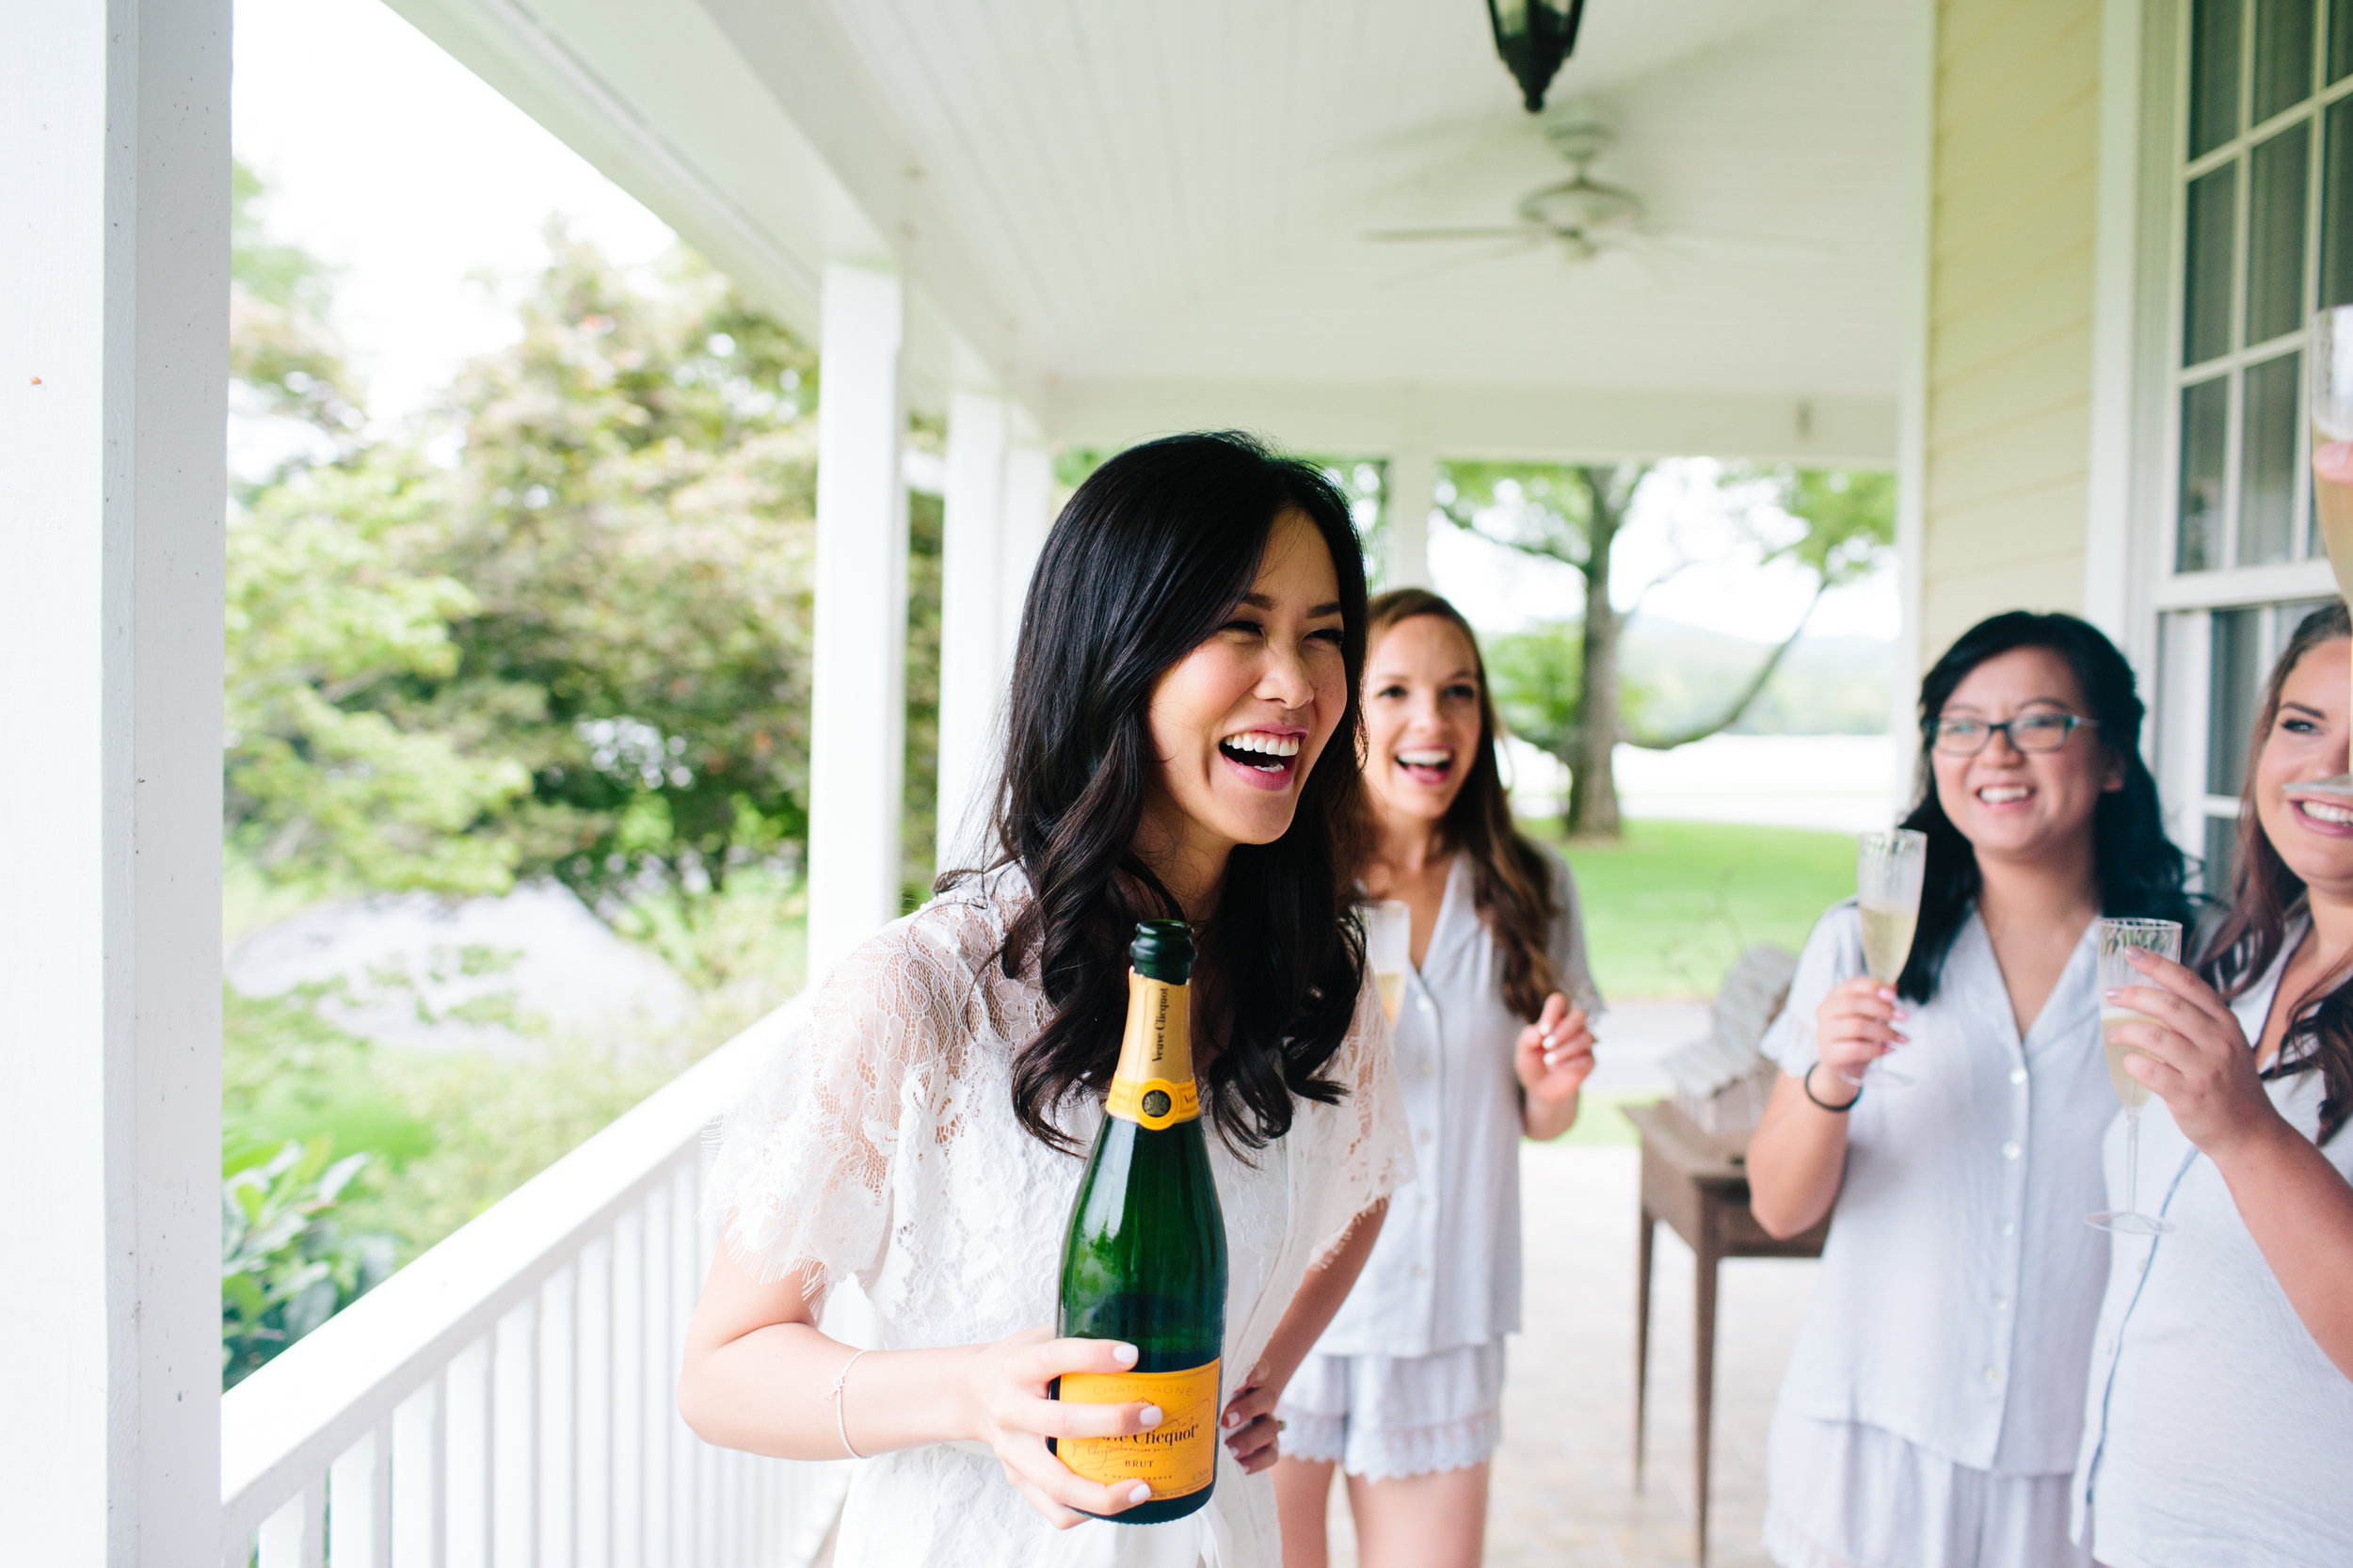 Fionnie_Jacob_Marblegate_Farm_Wedding_Knoxville_Abigail_Malone_Photography-252.jpg